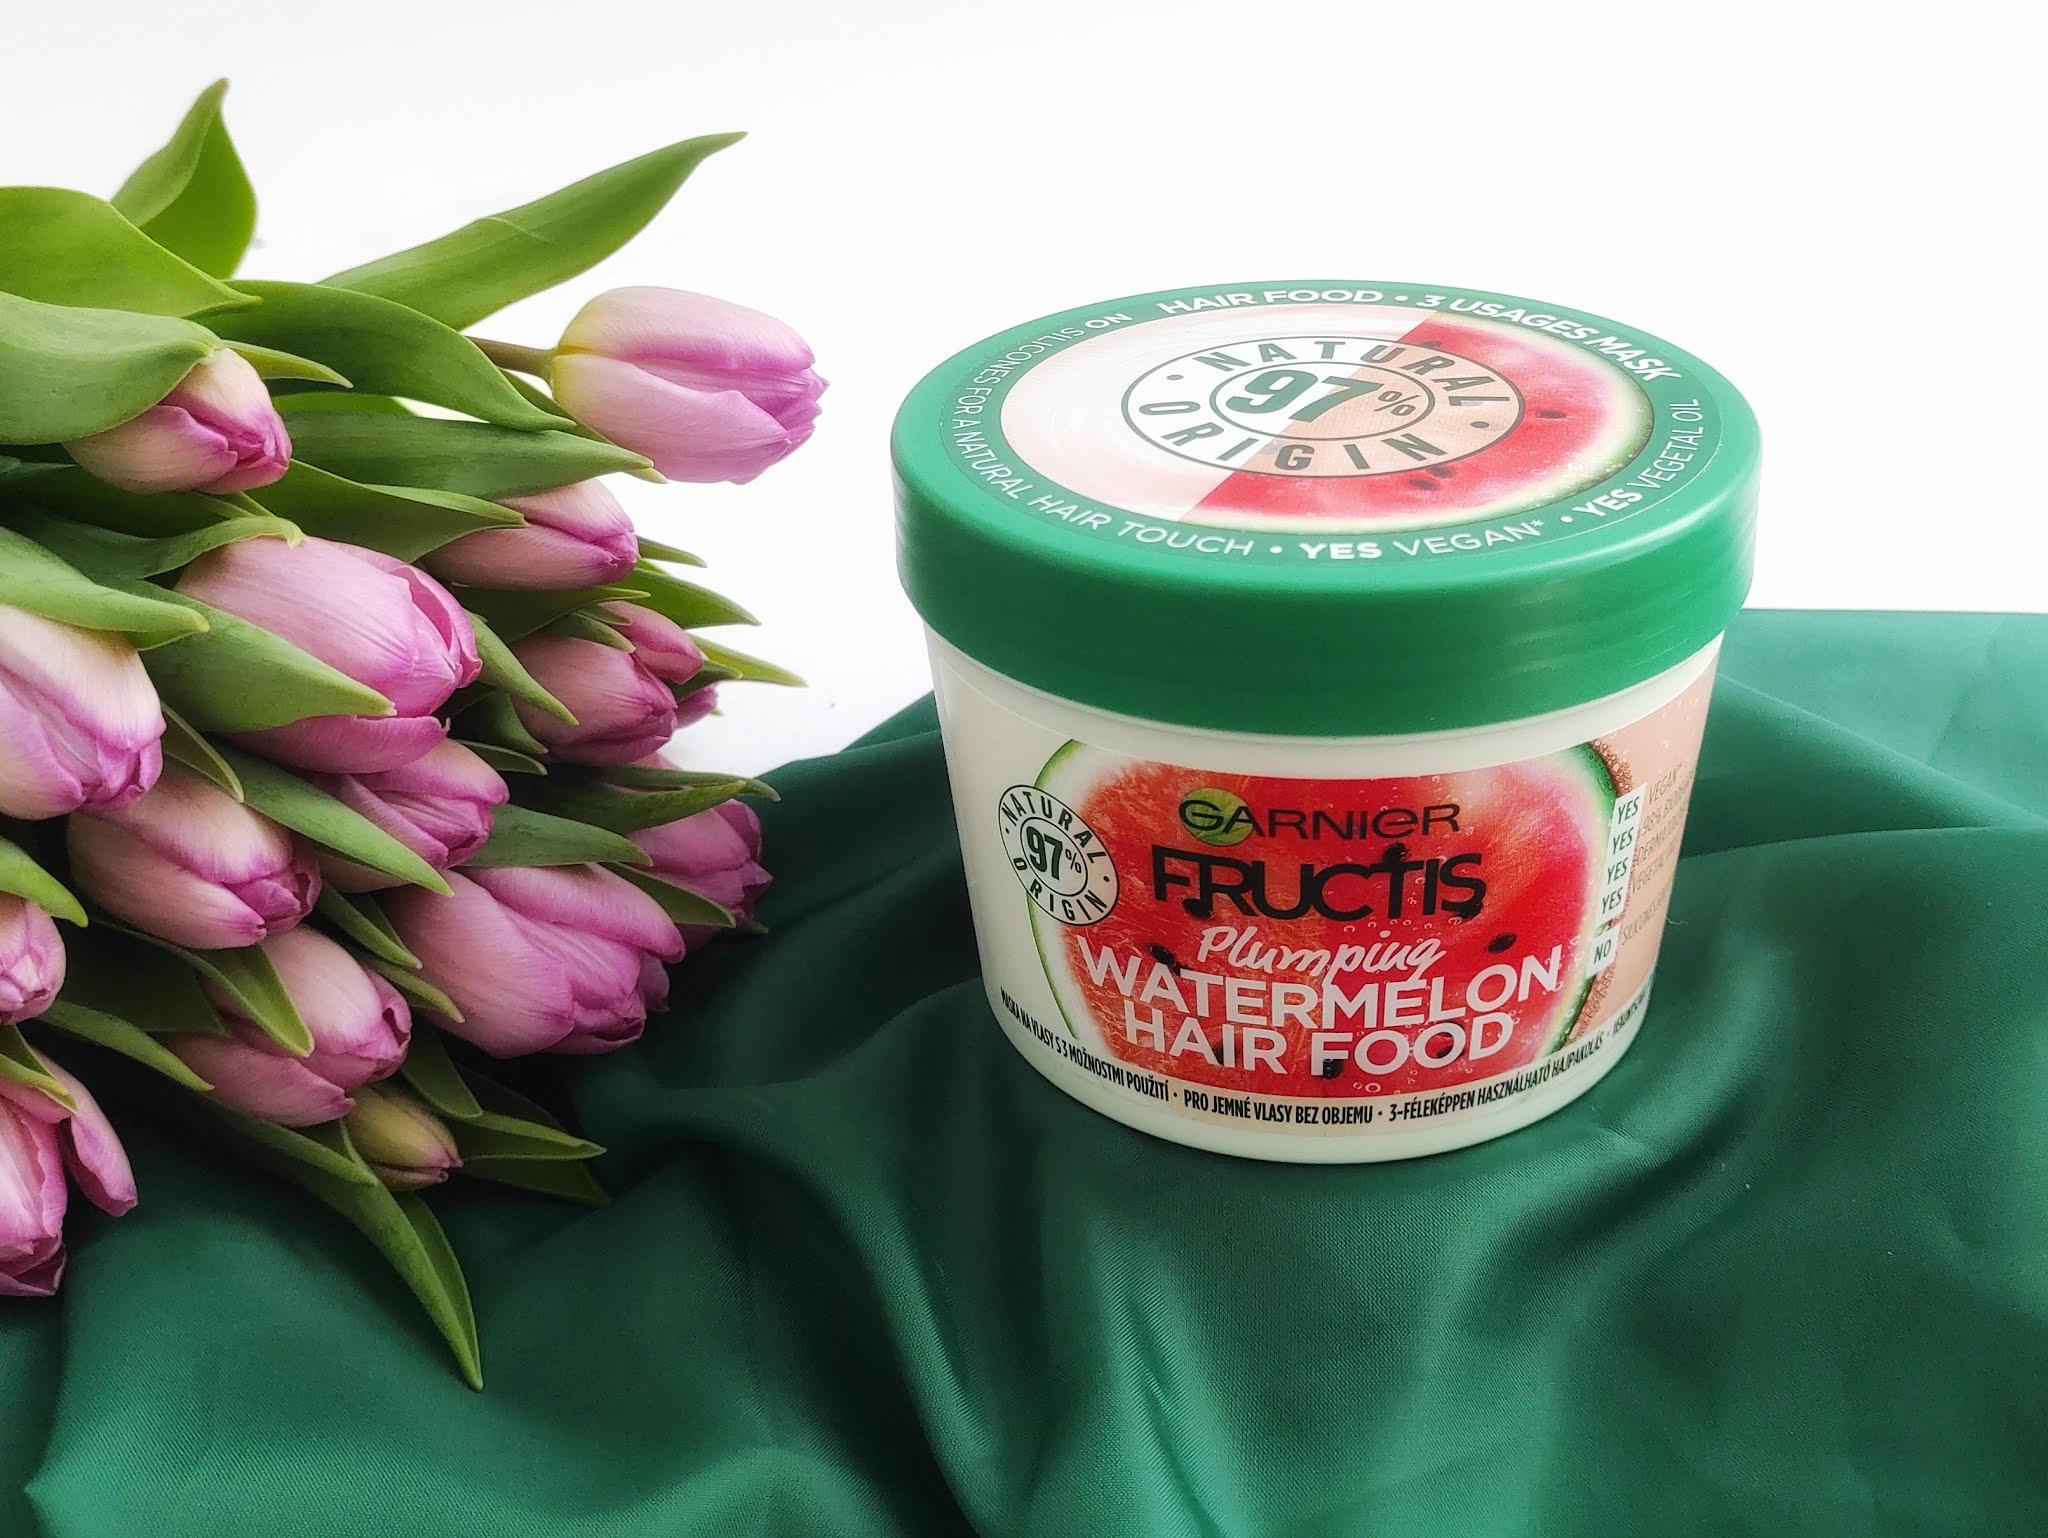 Maska do włosów Watermelon Hair Food Garnier Fructis